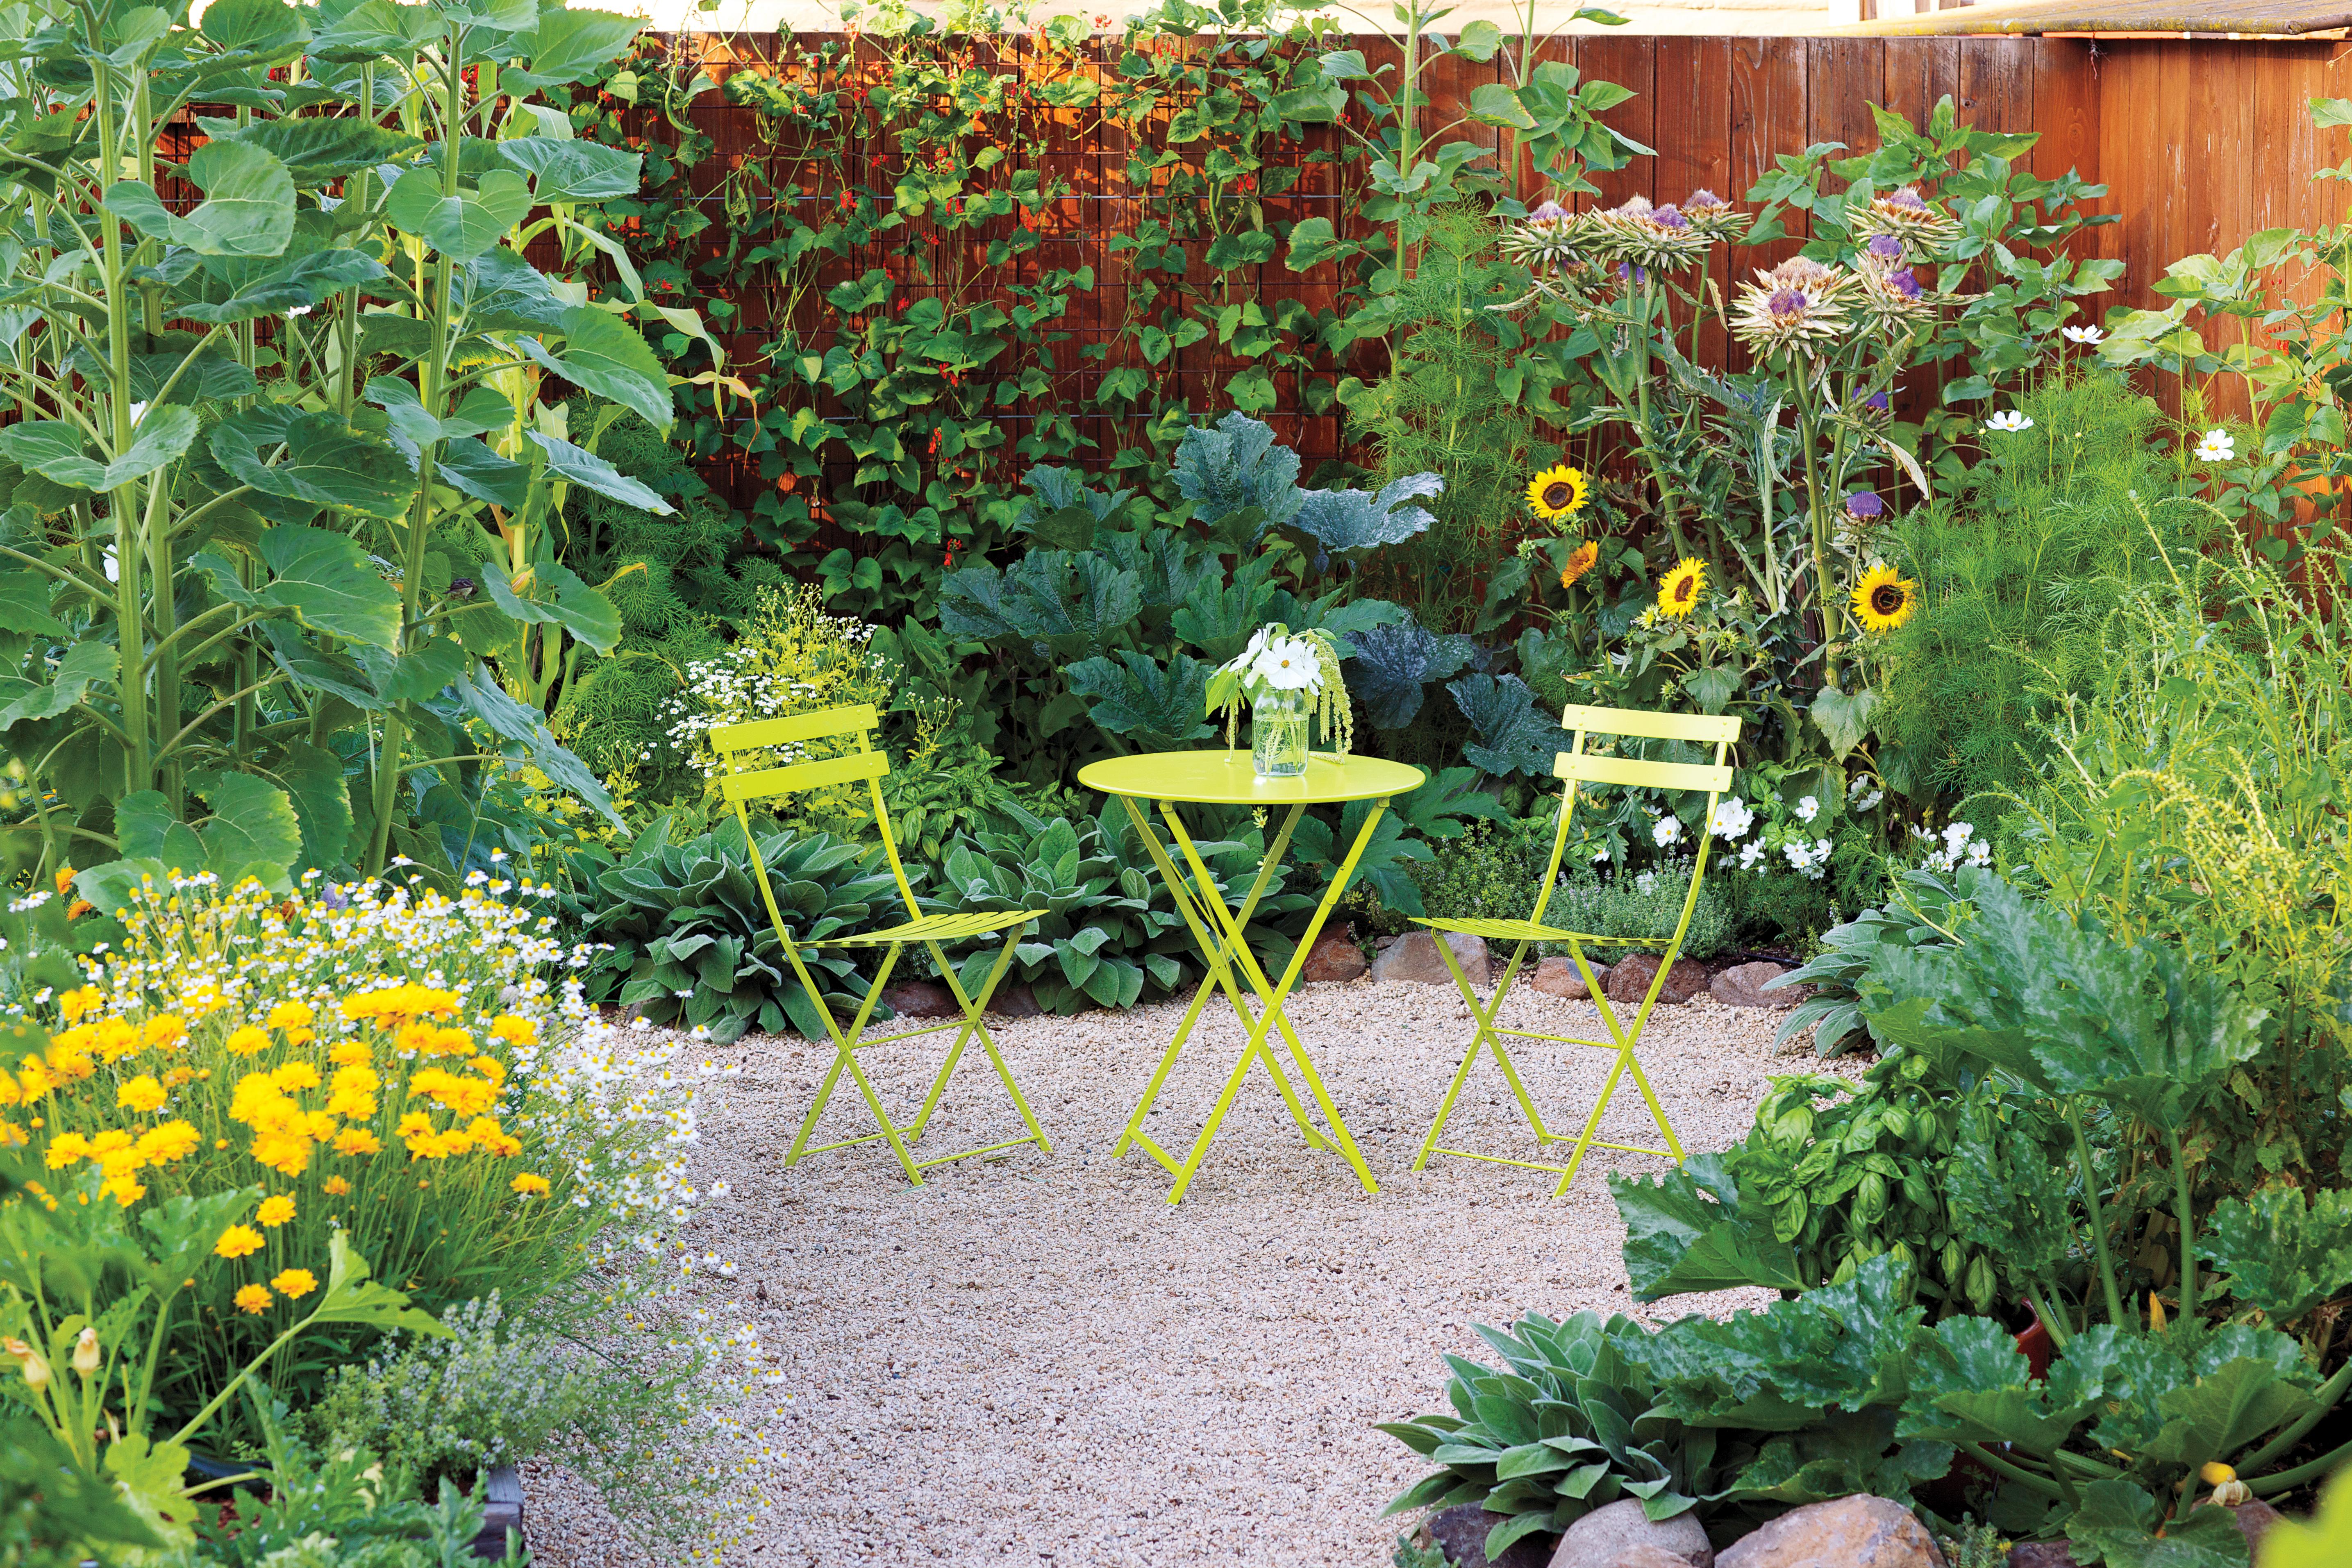 4 Easy-Care Flower Bed Ideas - Sunset - Sunset Magazine on shade gardening zone 3, landscaping zone 3, roses zone 3,